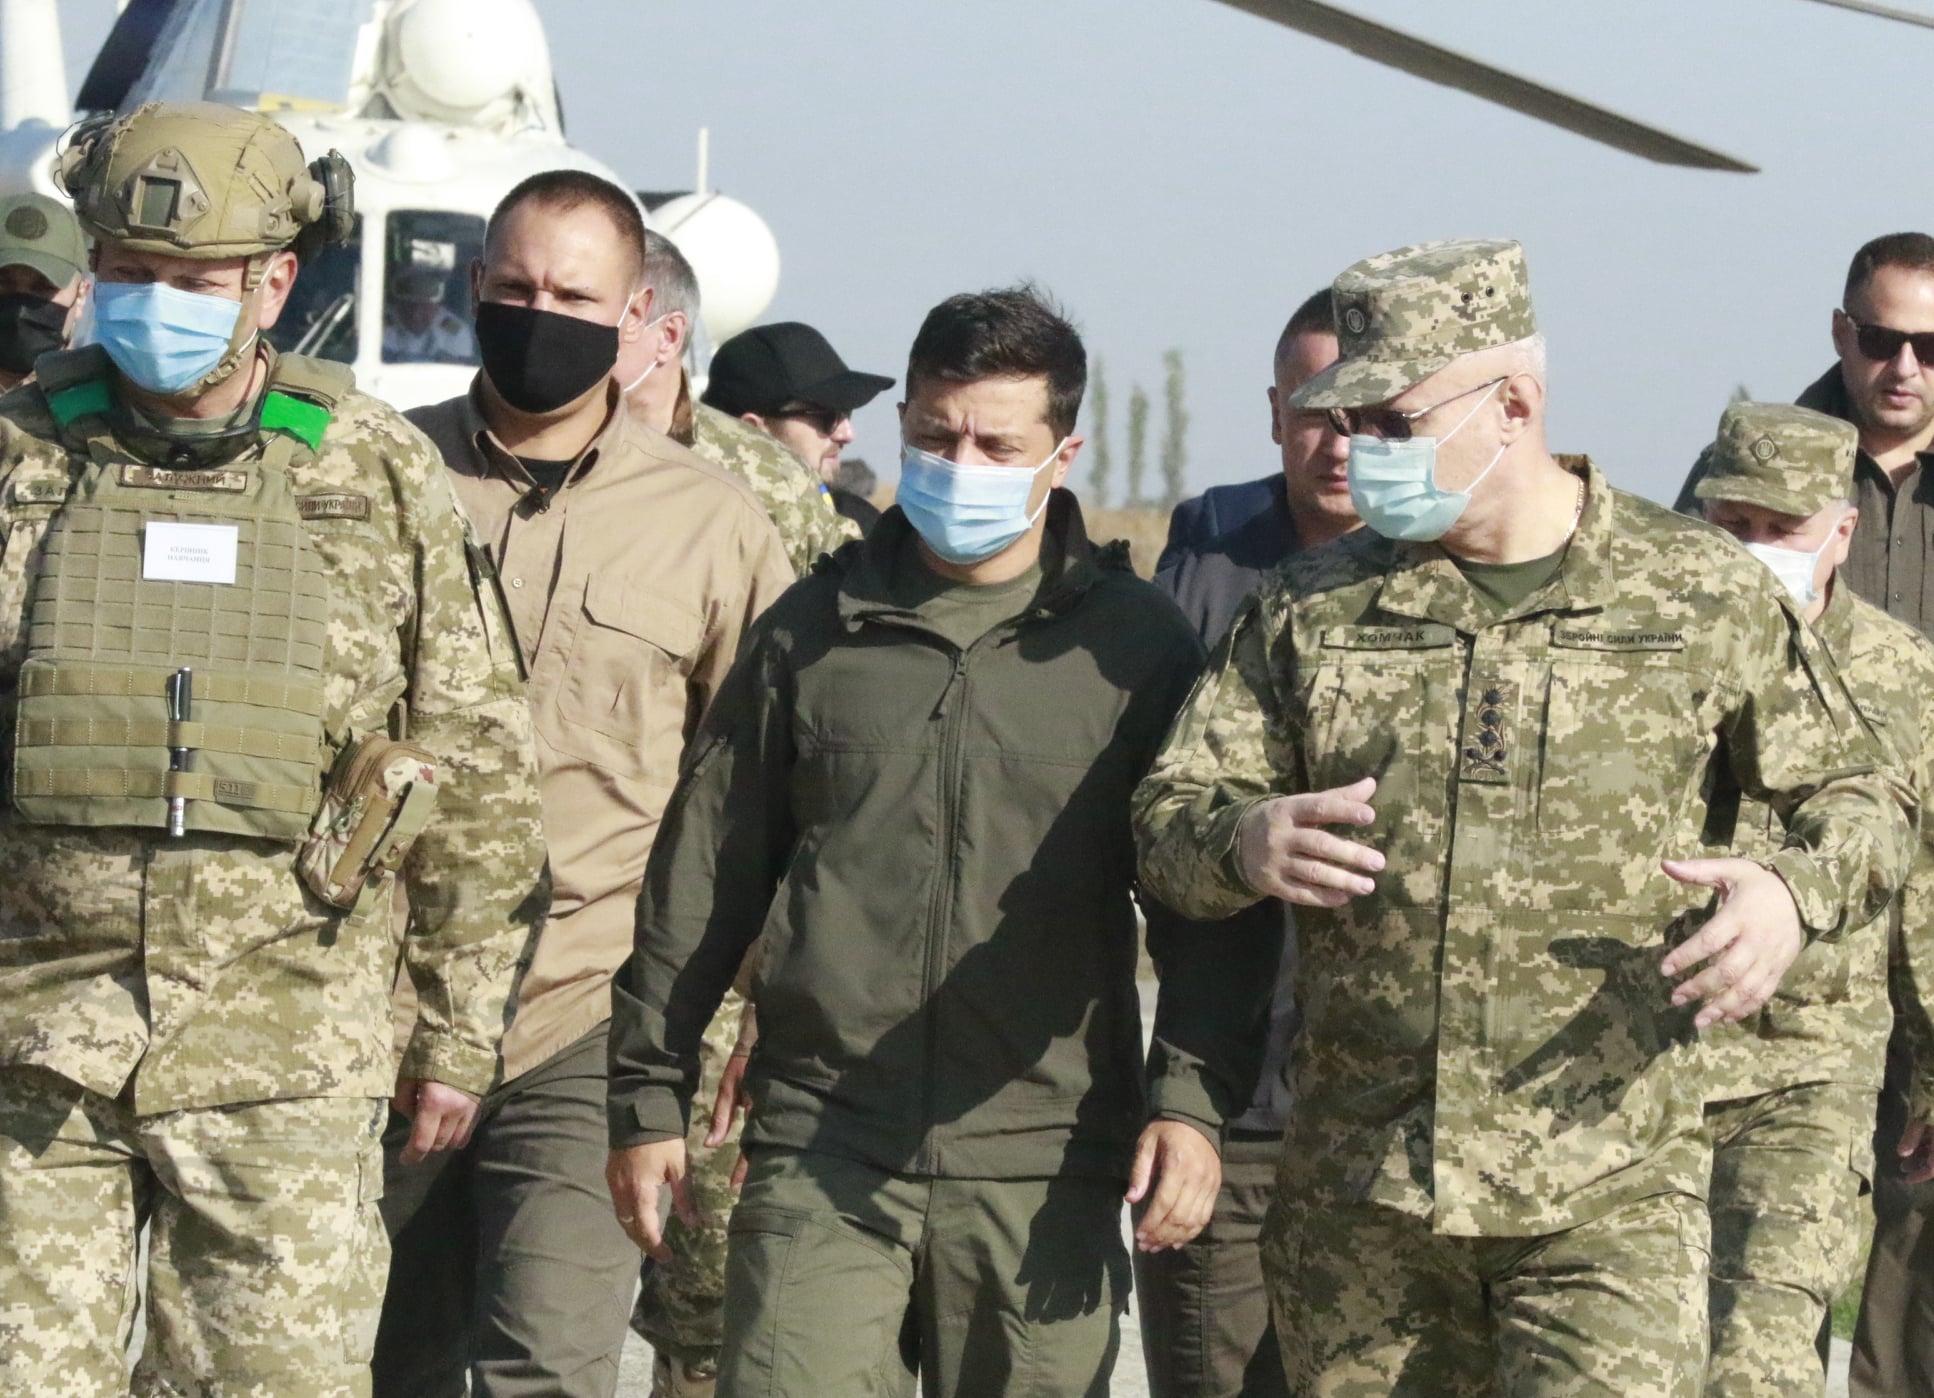 U.S.-Made Javelin ATGM Failed To Work In Demonstration In Front Of Ukrainian President Zelensky